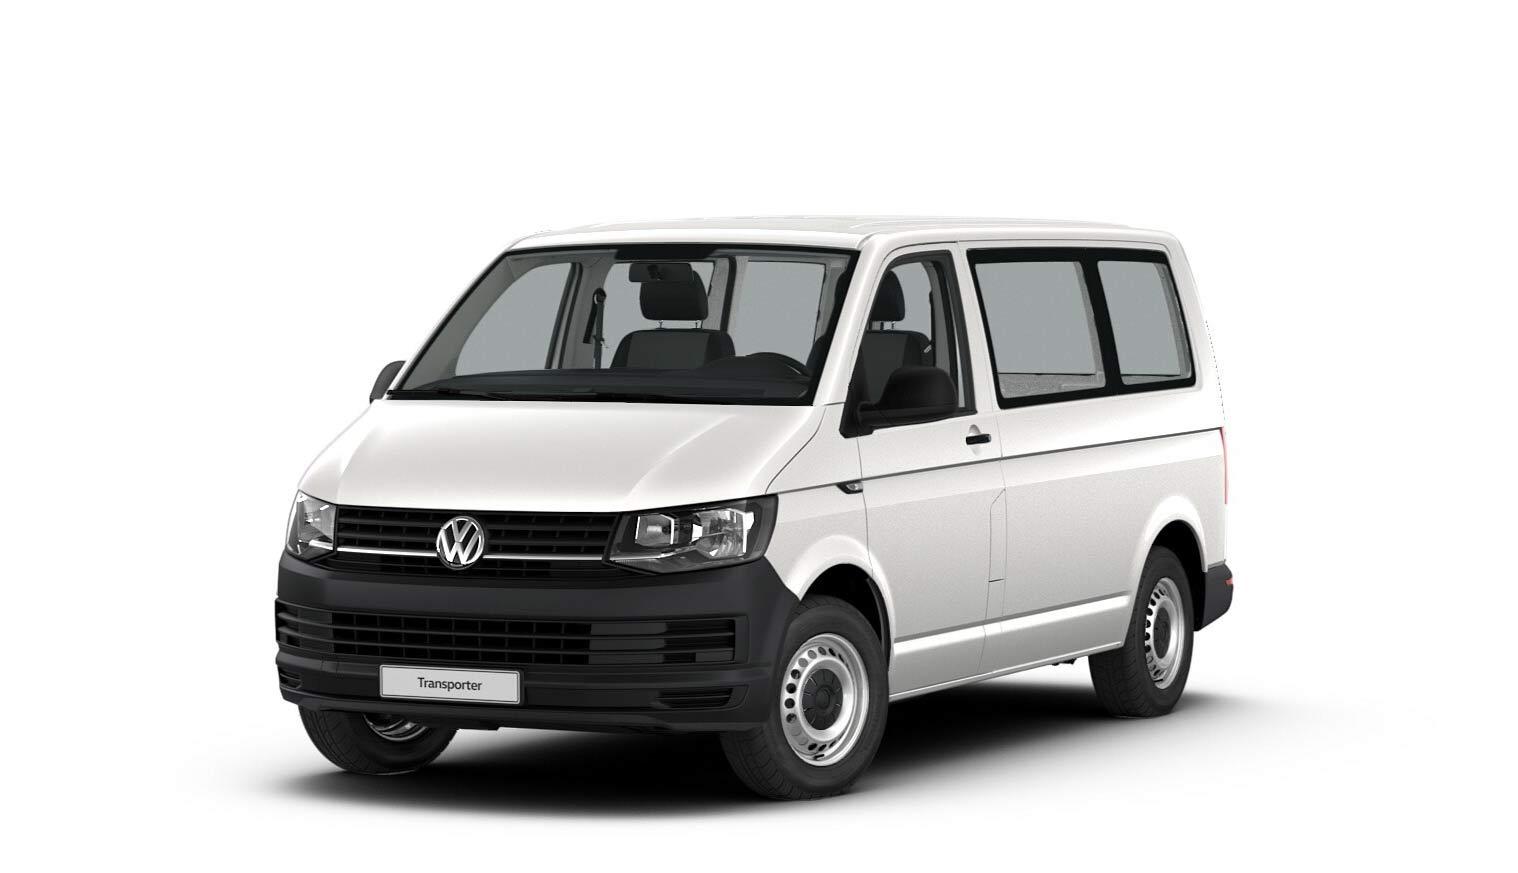 "Transporter Kombi ""EcoProfi"" Motor: 2,0 l TDI EU6 SCR BlueMotion Technology 75 kW Getriebe: 5-Gang-Schaltgetriebe Radstand: 3000 mm"